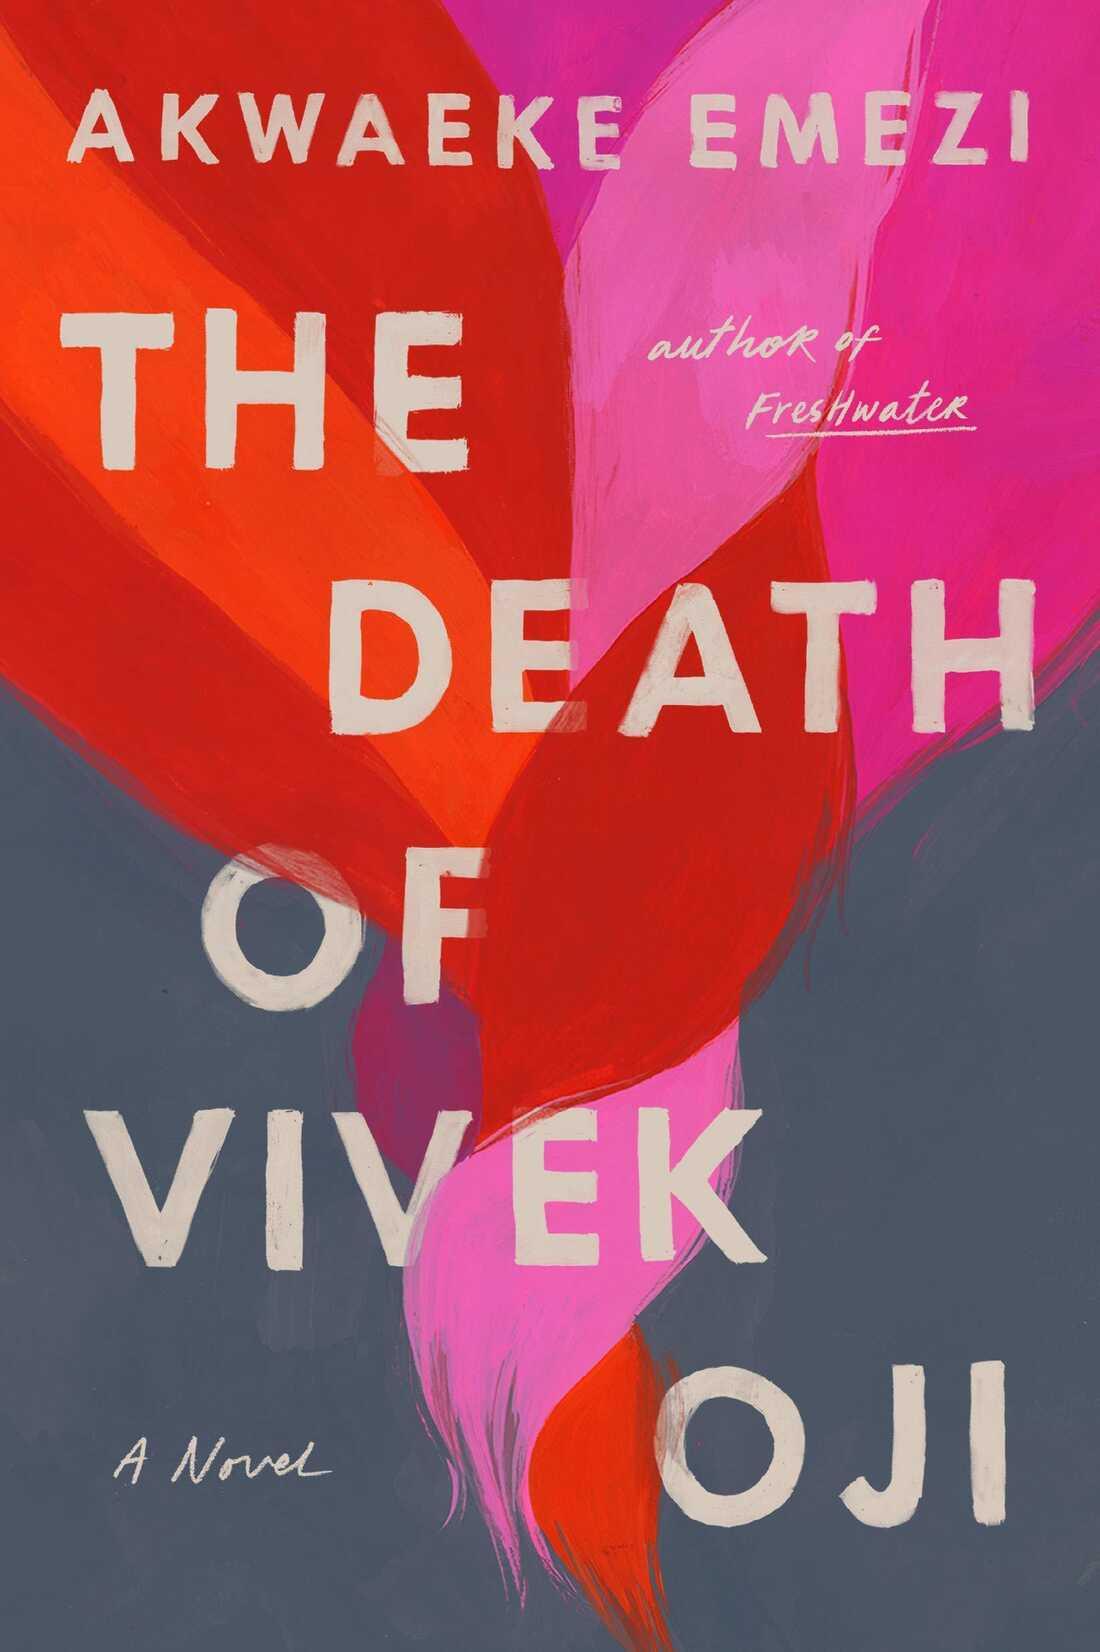 The Death of Vivek Oji, by Akwaeke Emezi